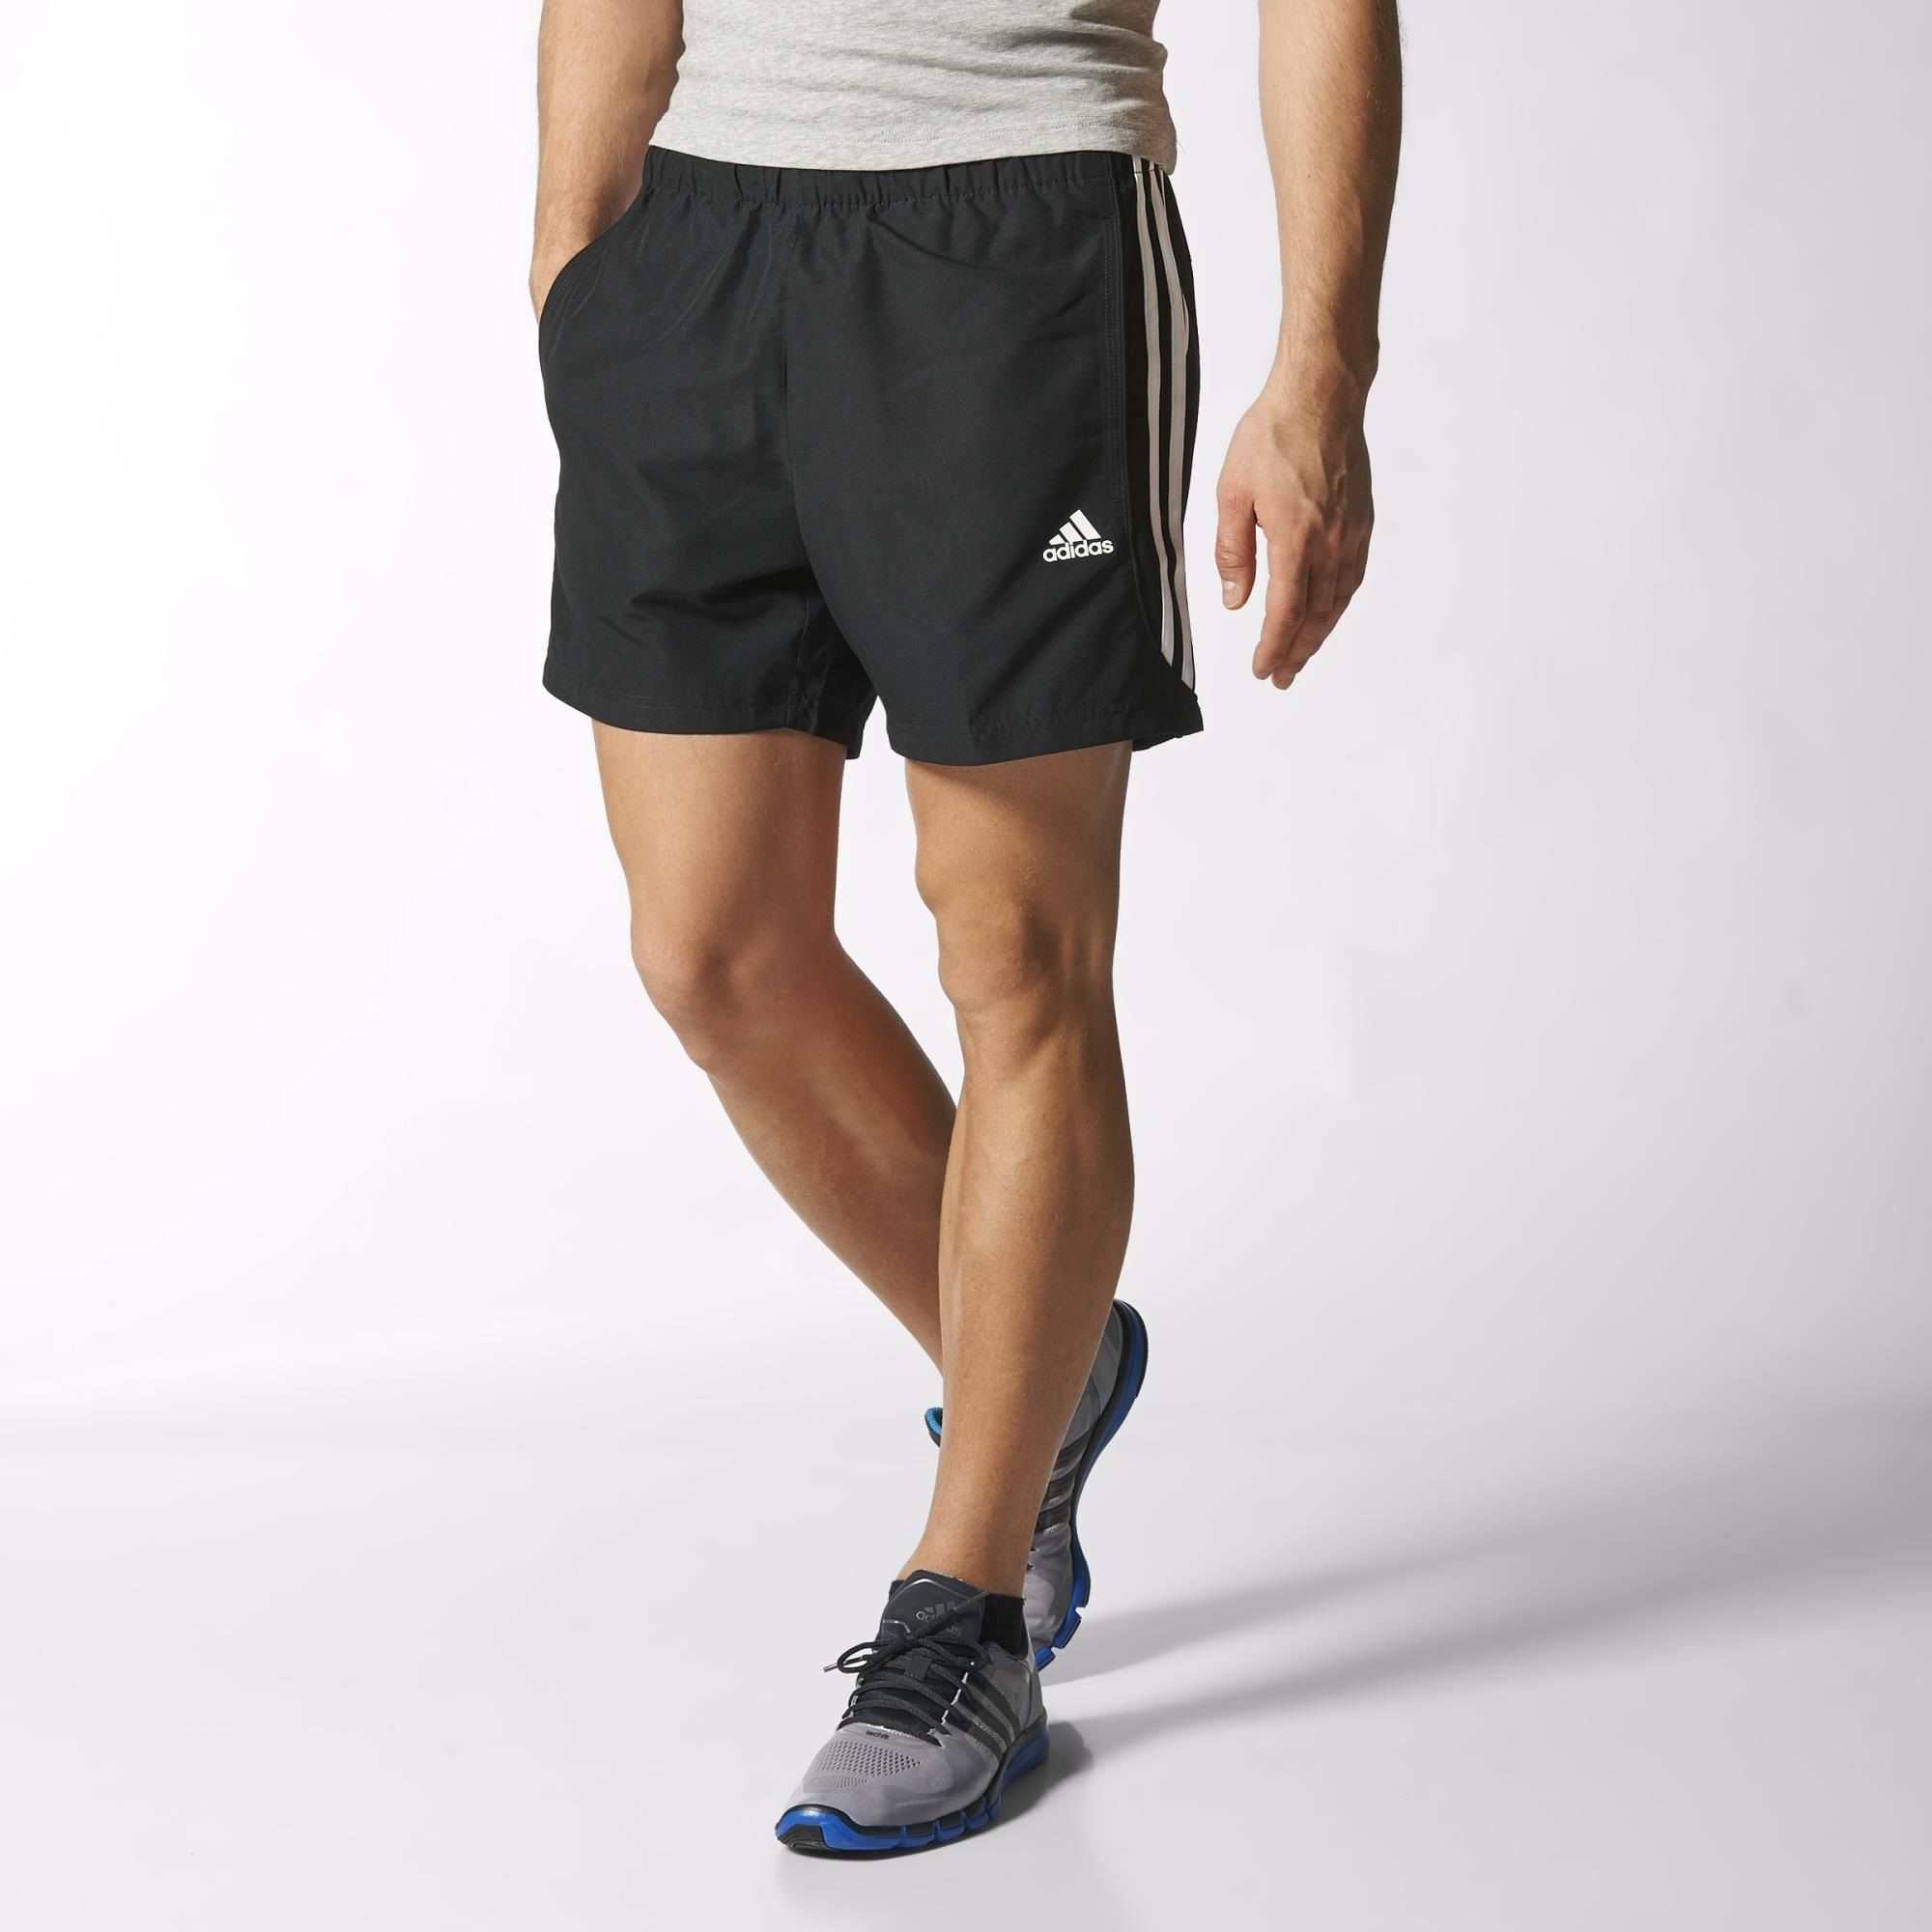 Men's Sport Essentials 3-Stripes Chelsea Shorts